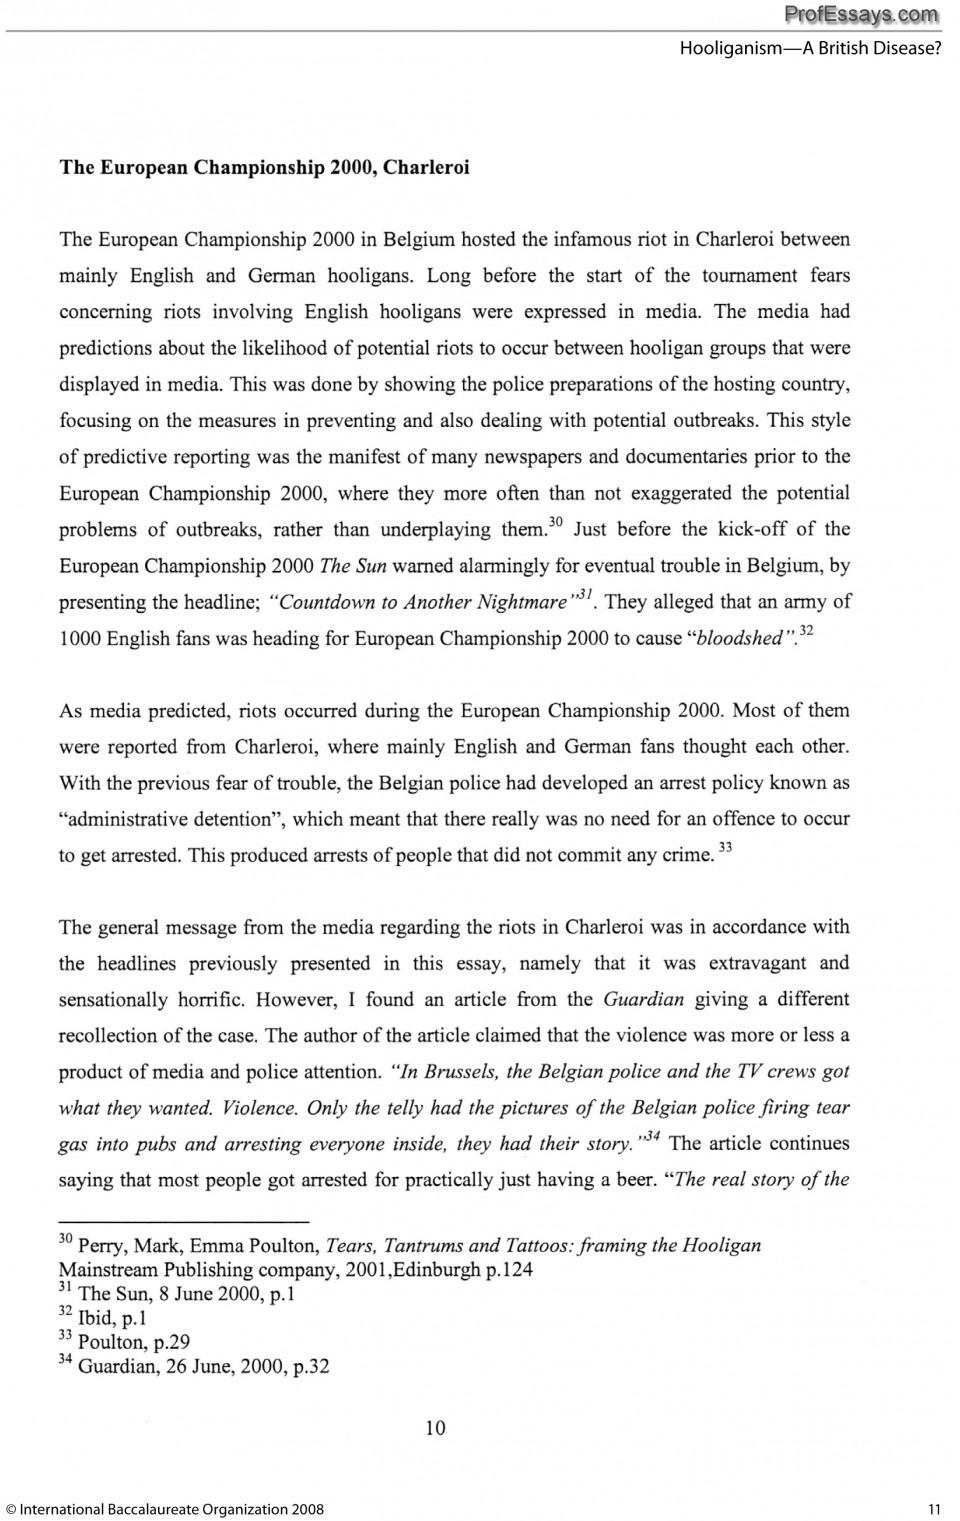 Dissertations on johnson and johnson